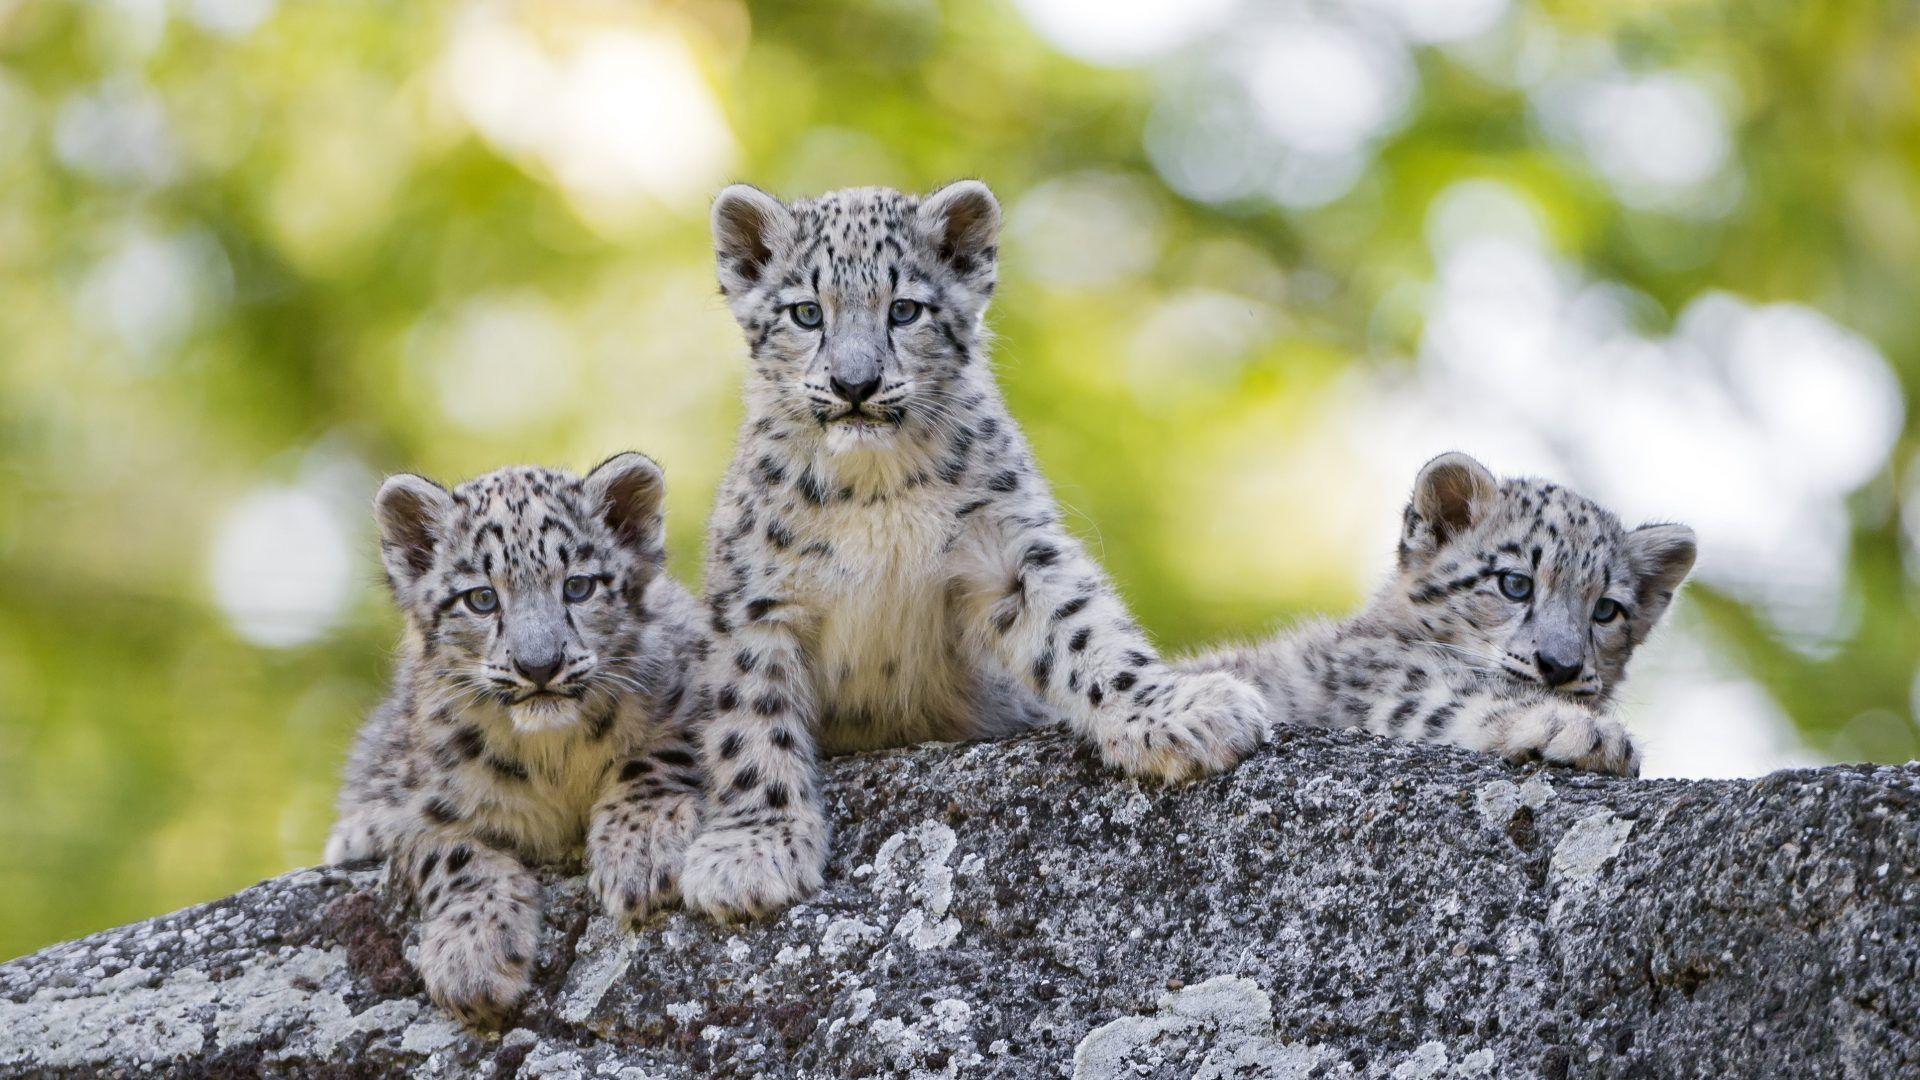 Cute Yoda Wallpaper Baby Snow Leopard Wallpapers Wallpaper Cave